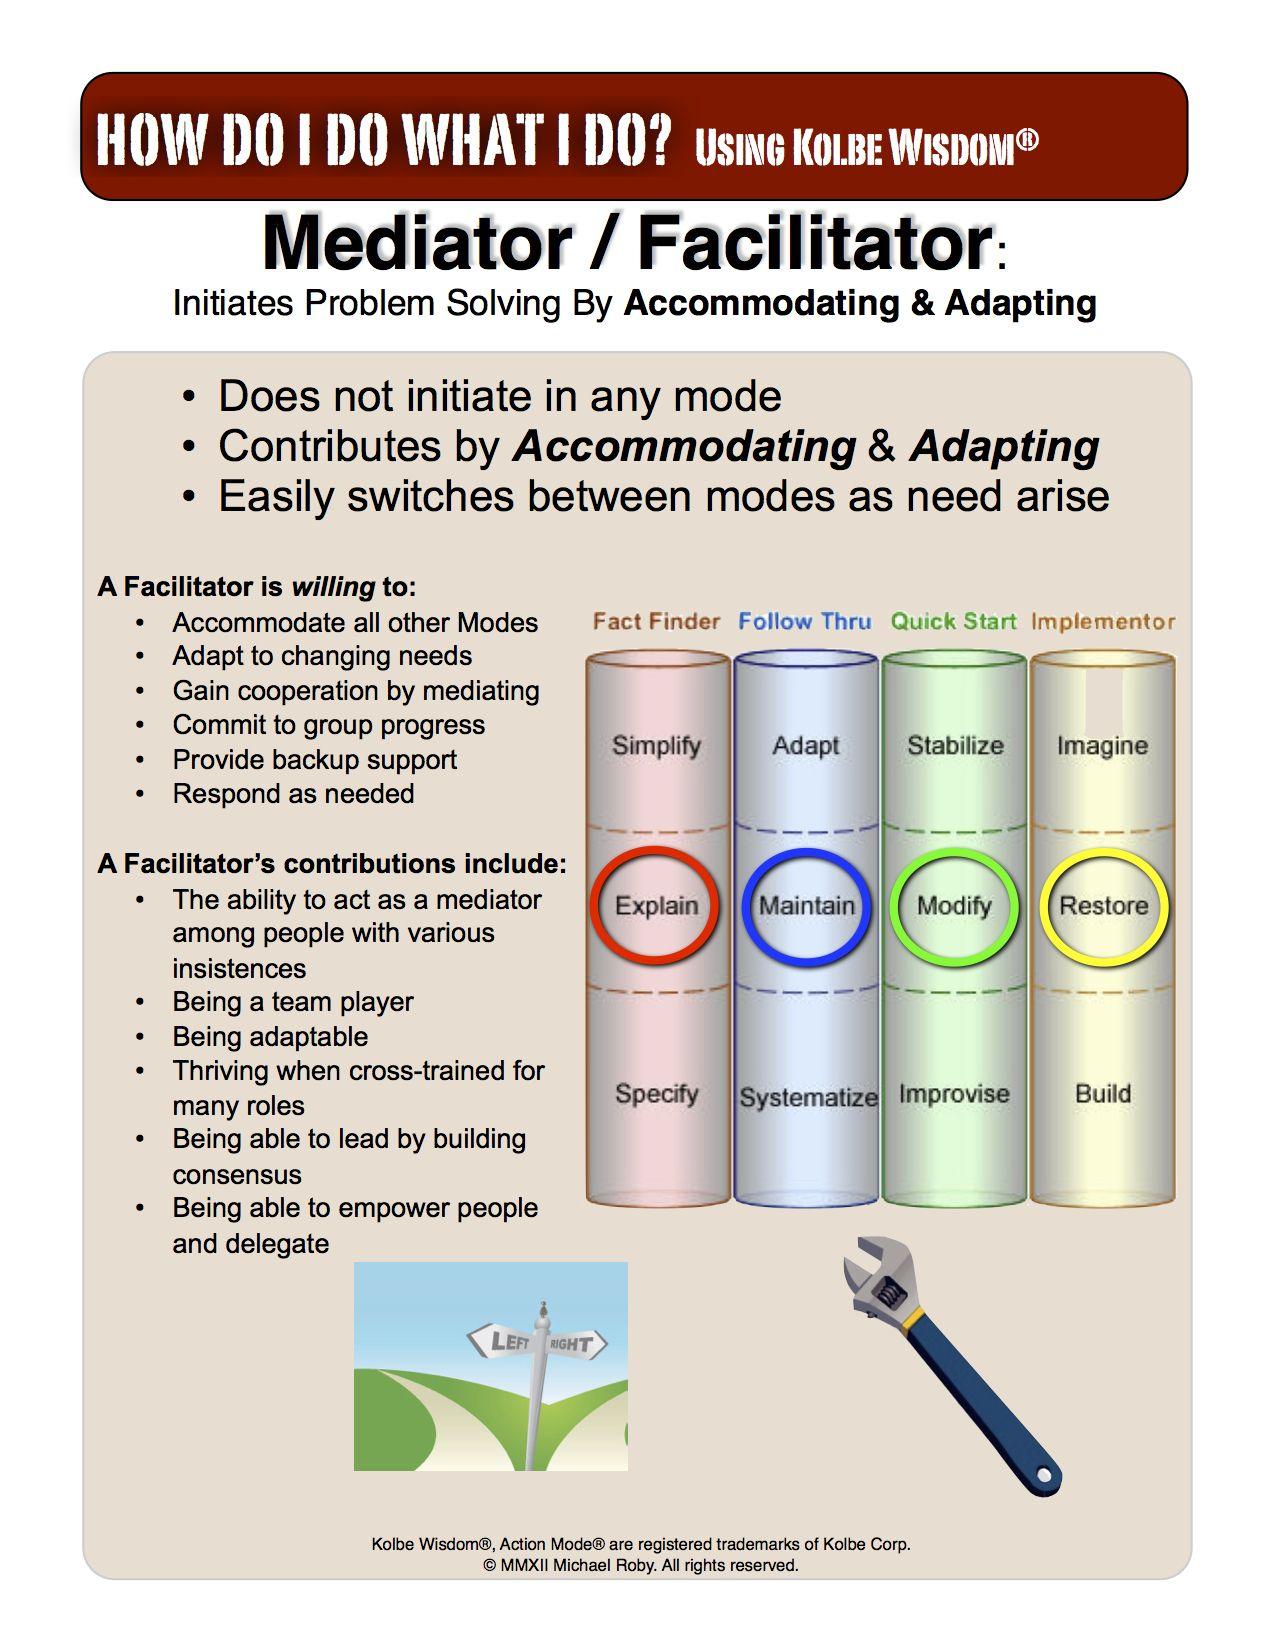 Kolbe Action Mode® Infograph Mediator/Facilitator. As a